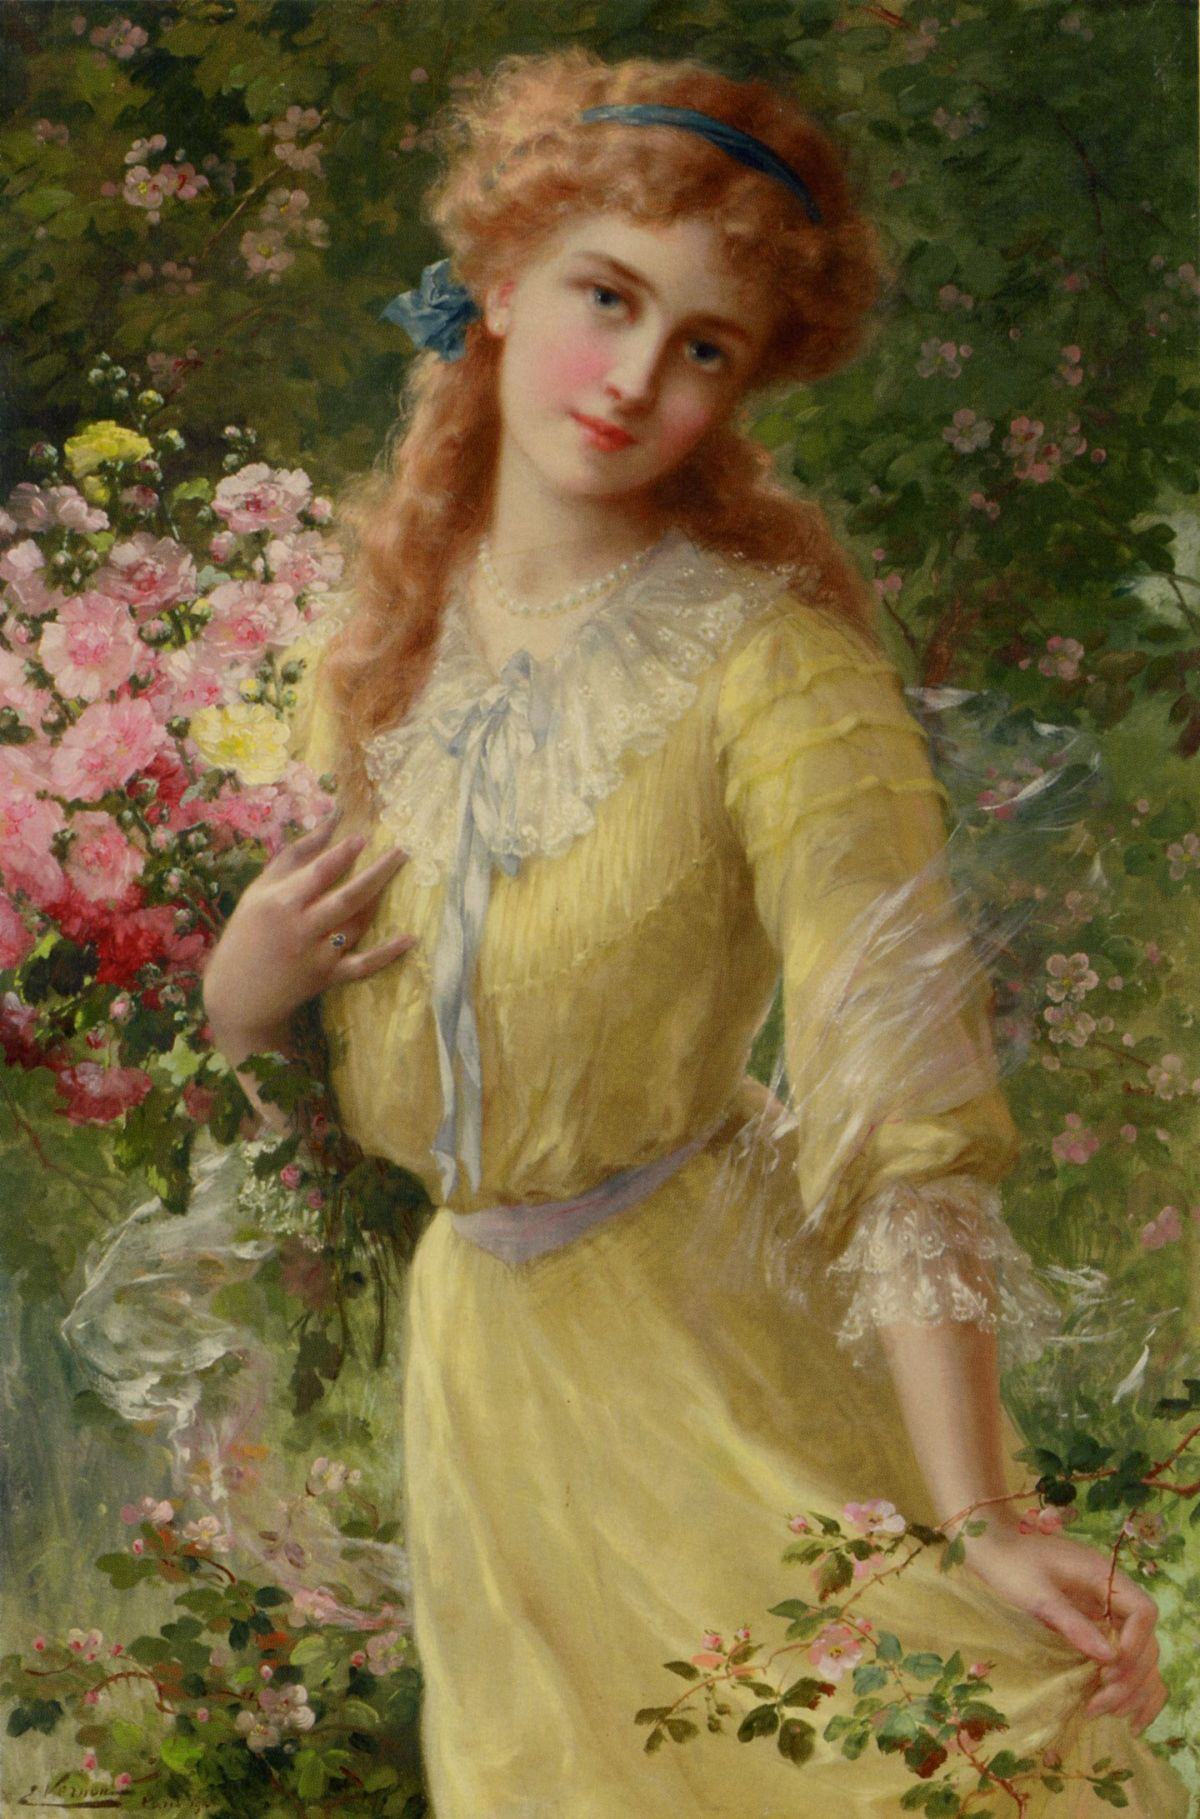 In the Garden by Emile Vernon